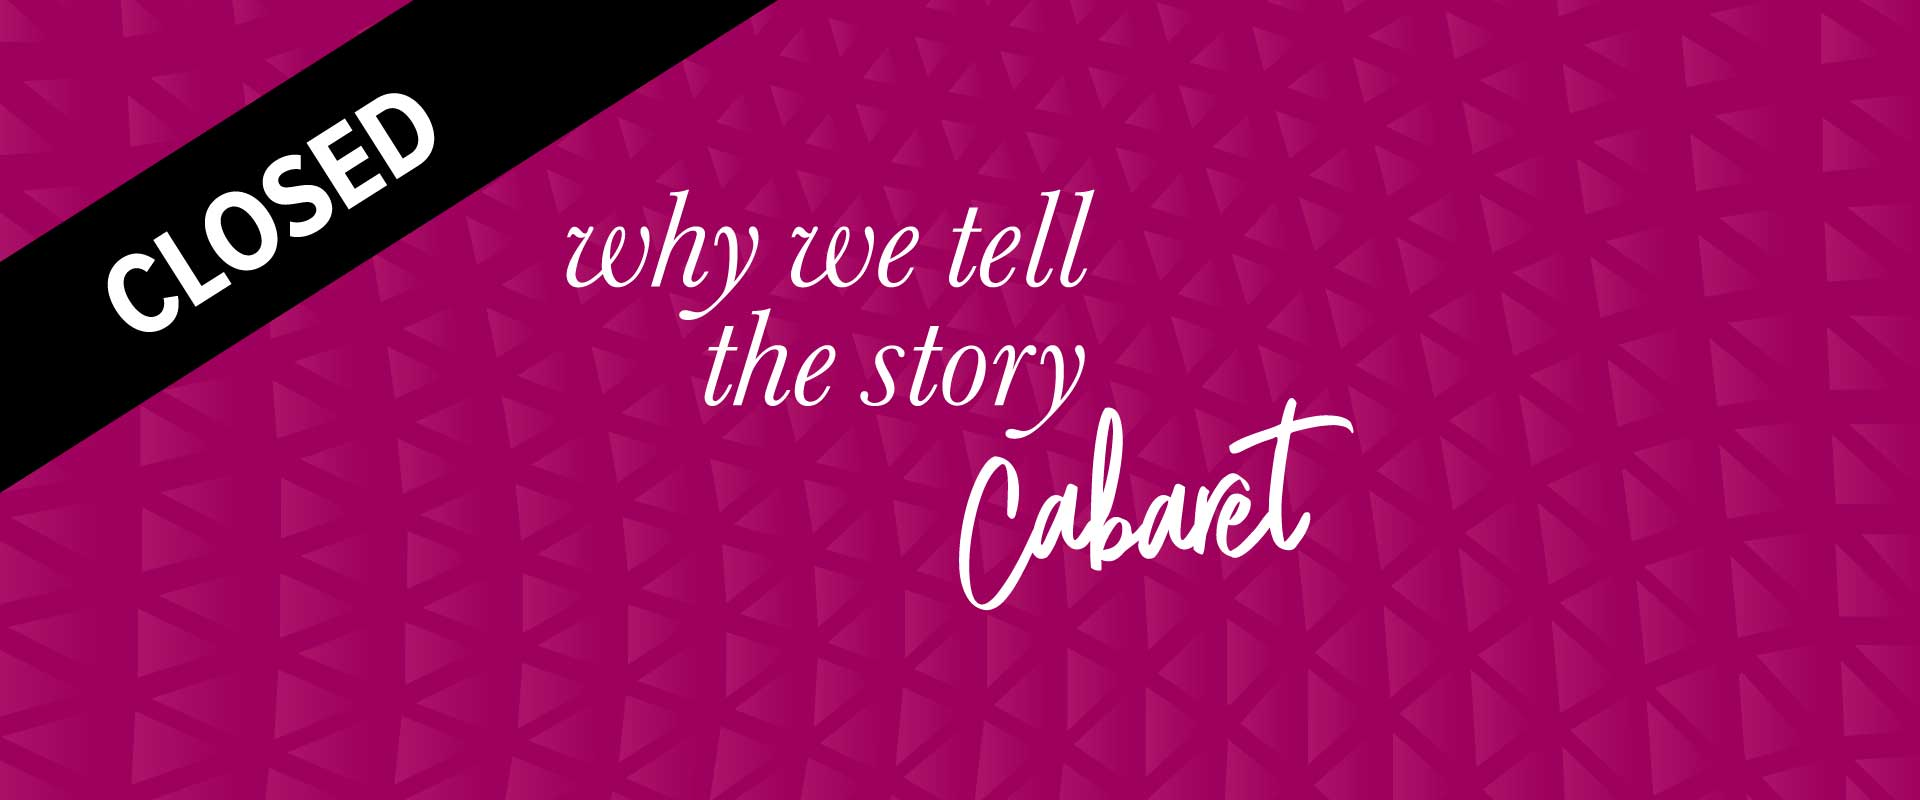 Wordmark image of Why We Tell the Story cabaret